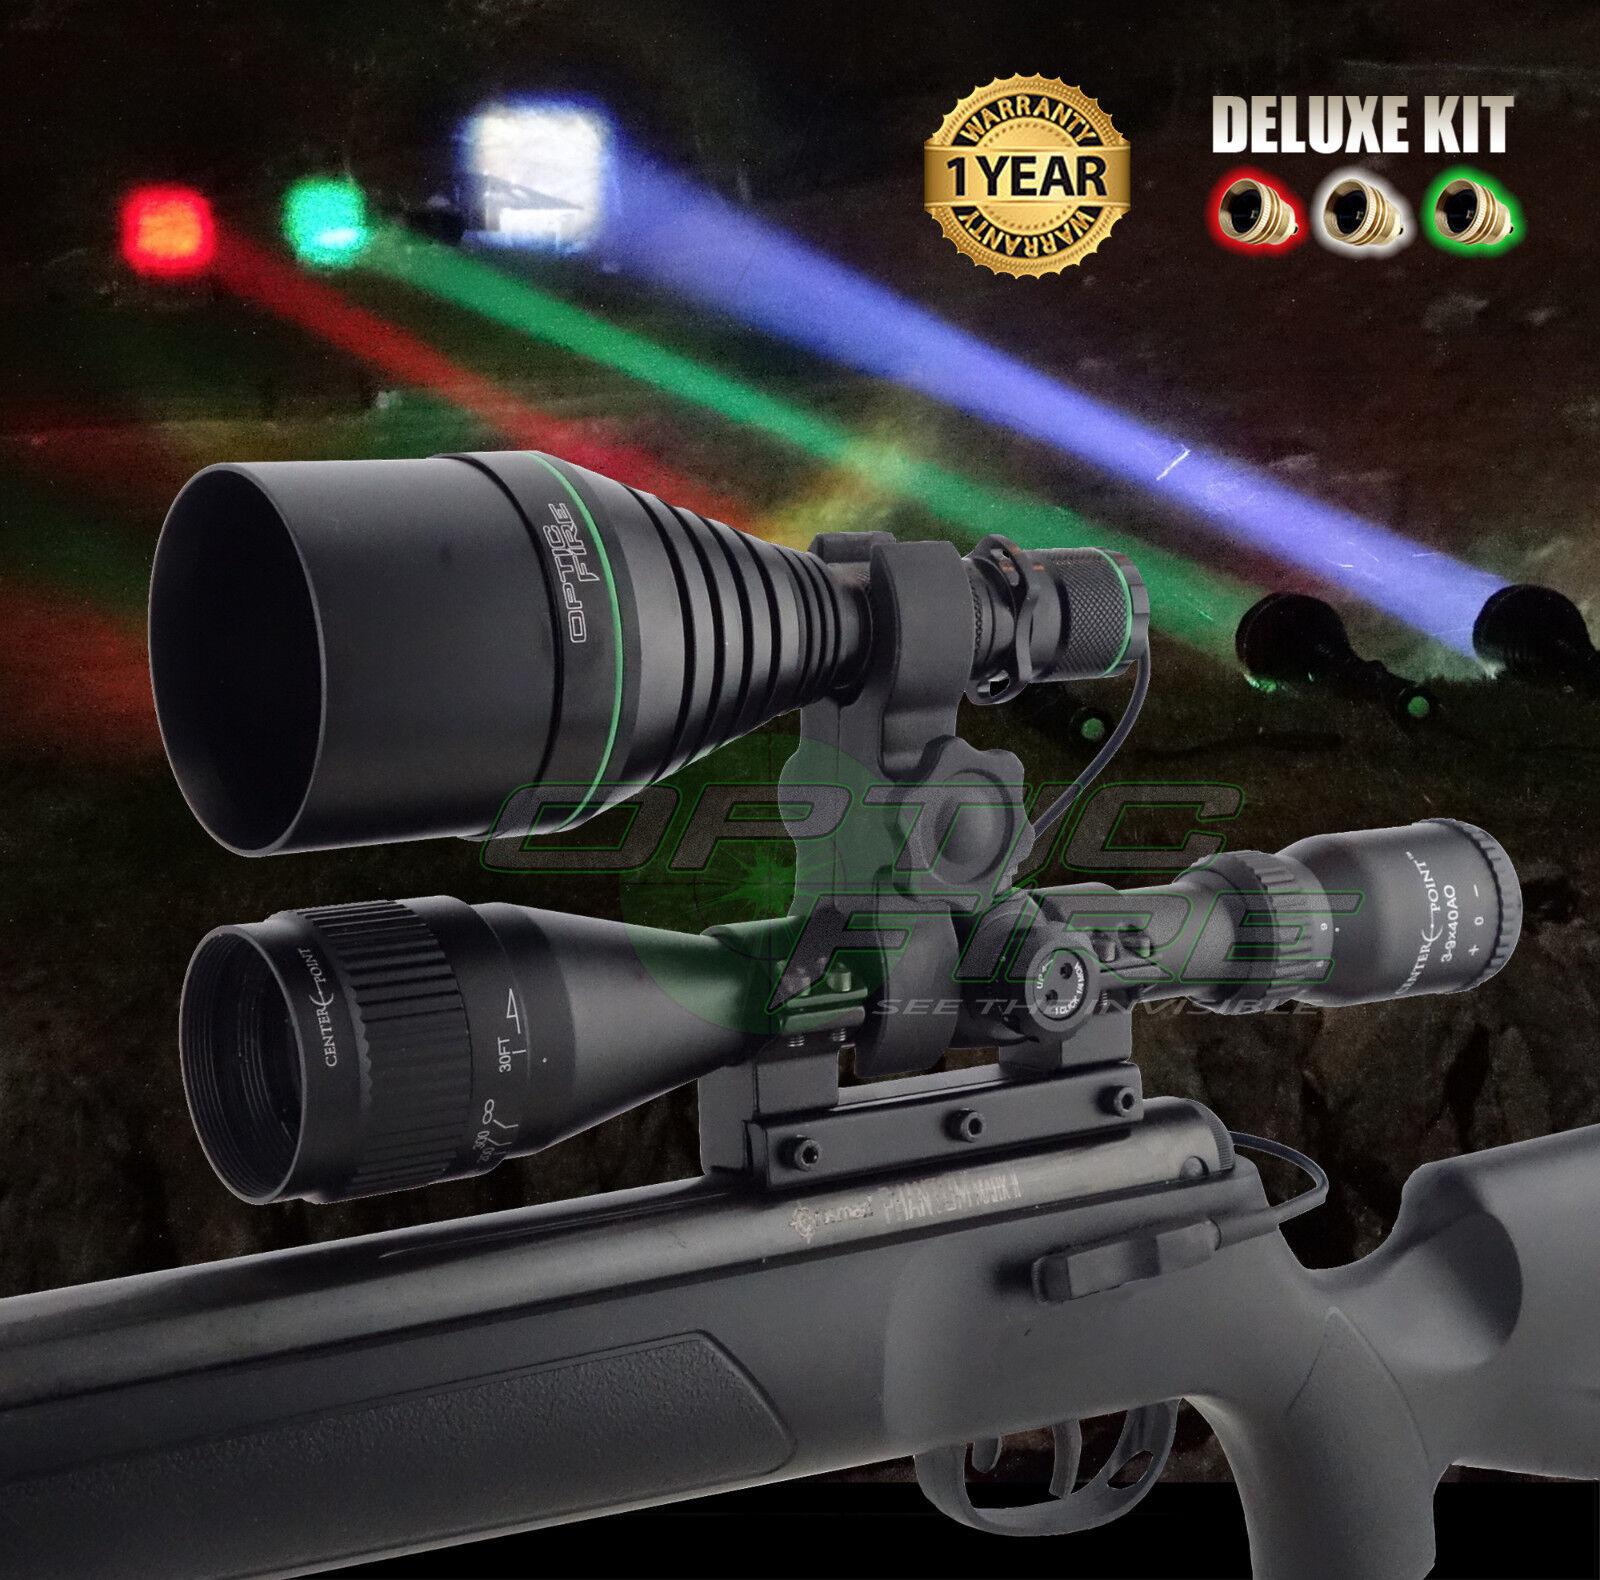 Opticfire ® XS 3 LED Luz de Lámpara Montaje Alcance Pistola De Lámpara de Antorcha Caza Lamping Kit De Lujo bde3fd